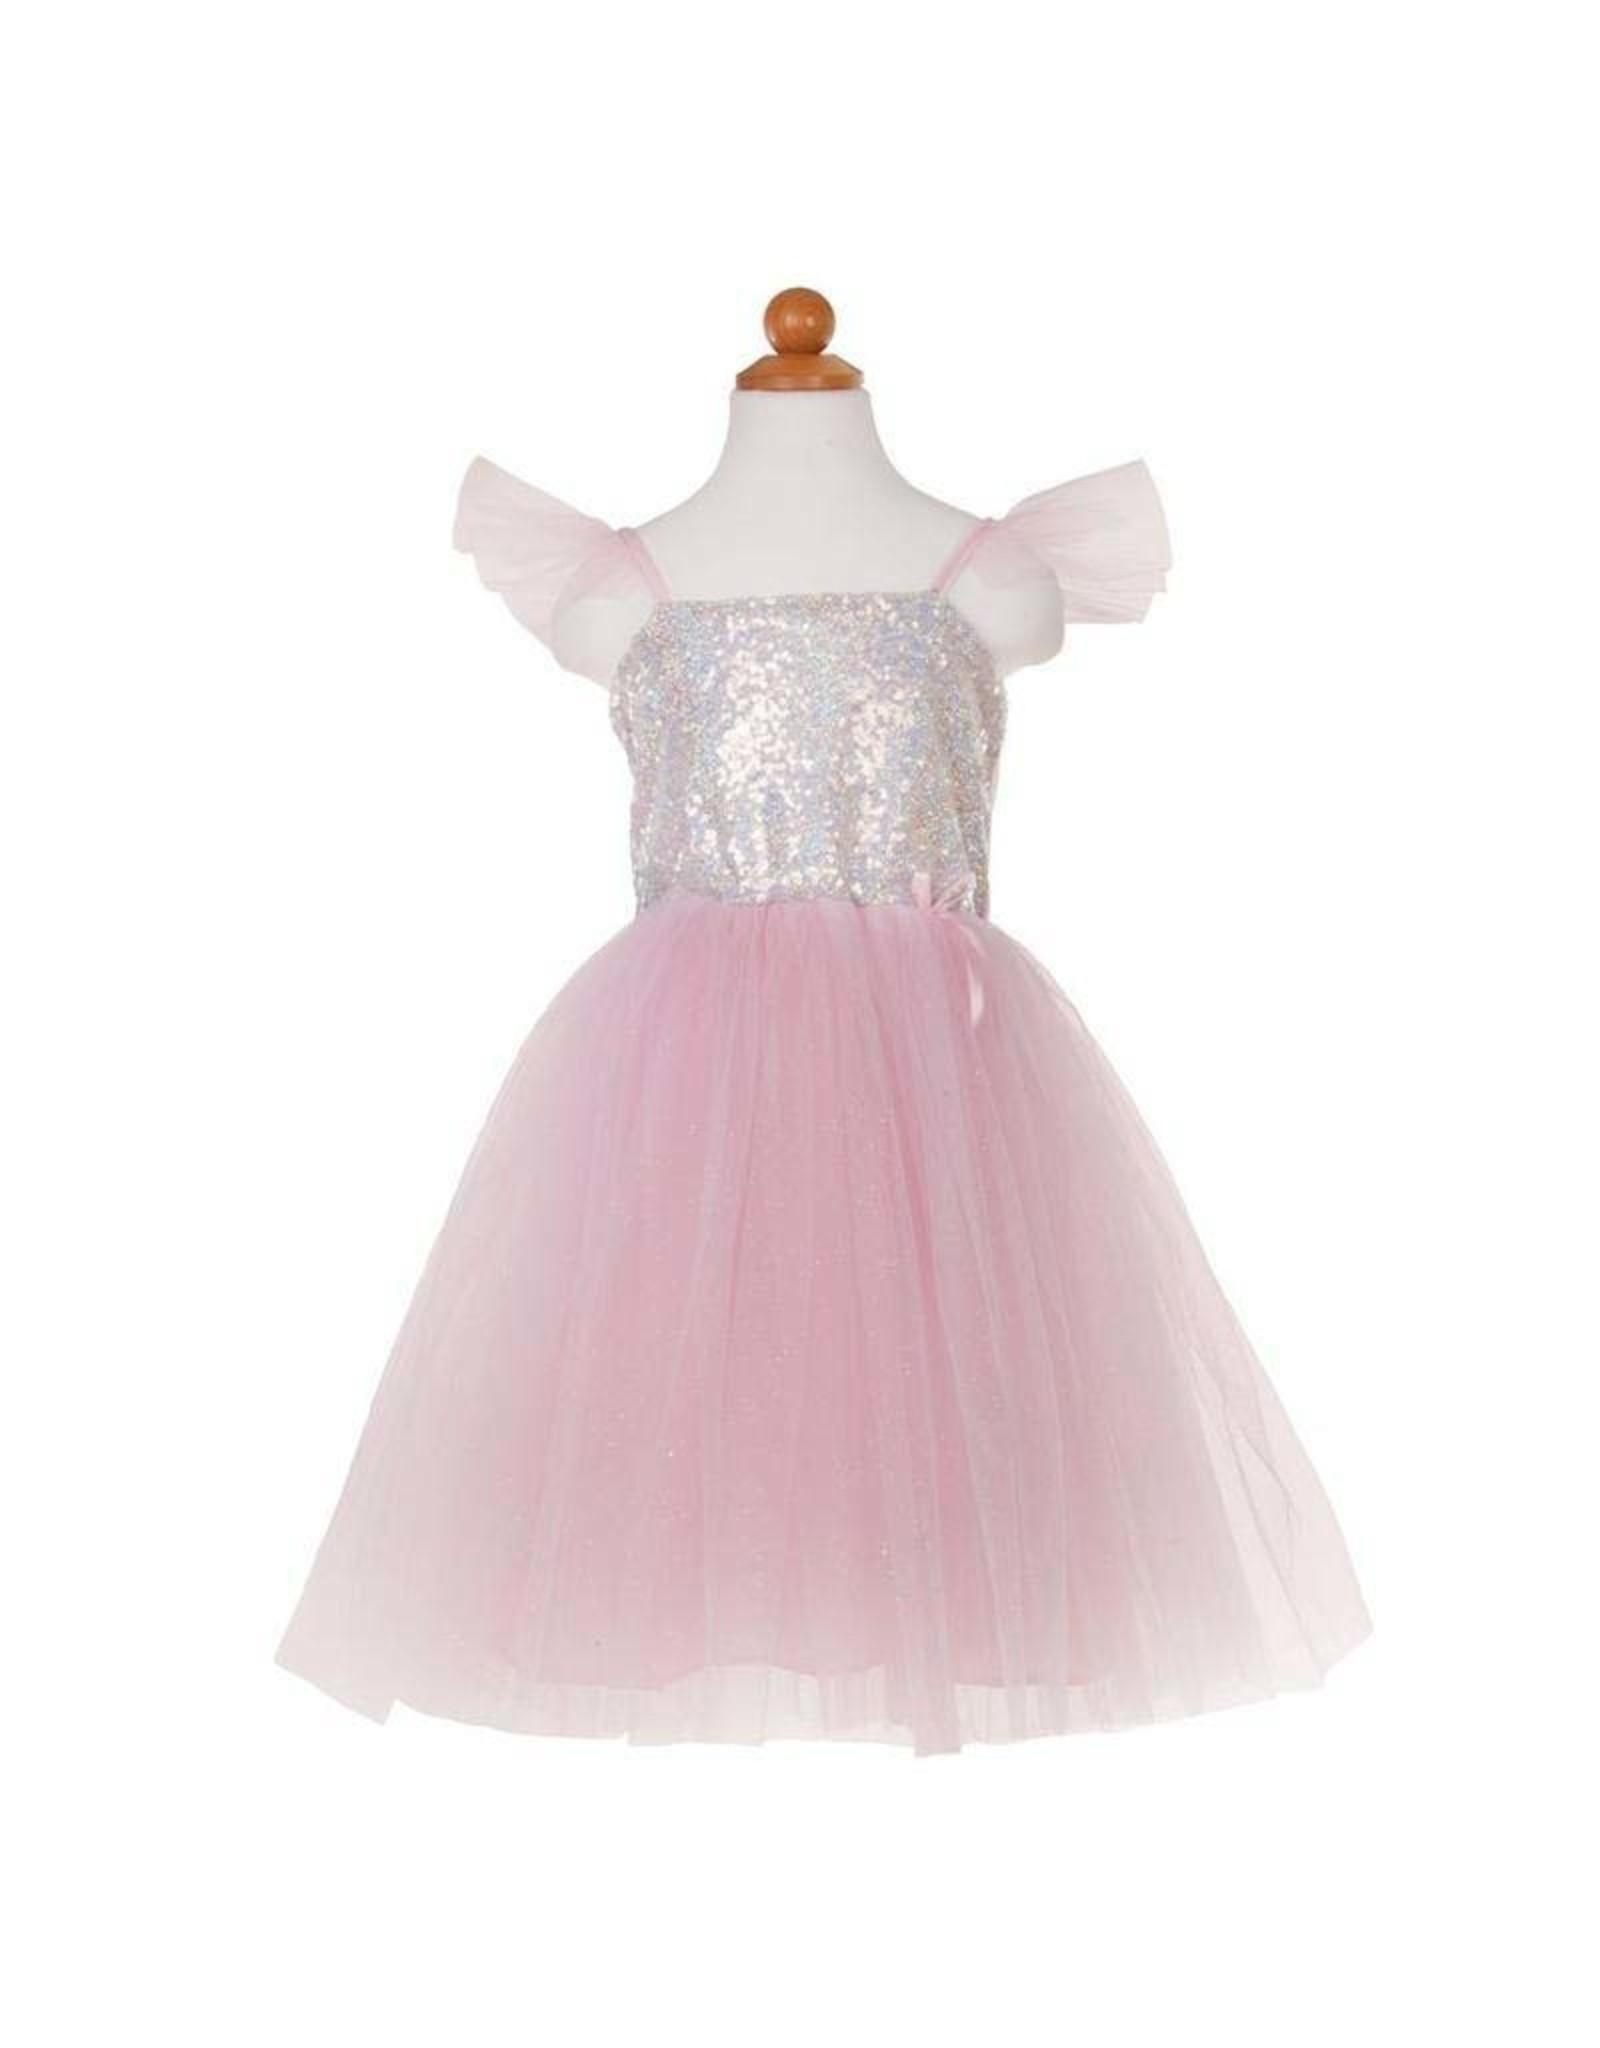 Great Pretenders Silver Sequins Princess Dress Size 7-8